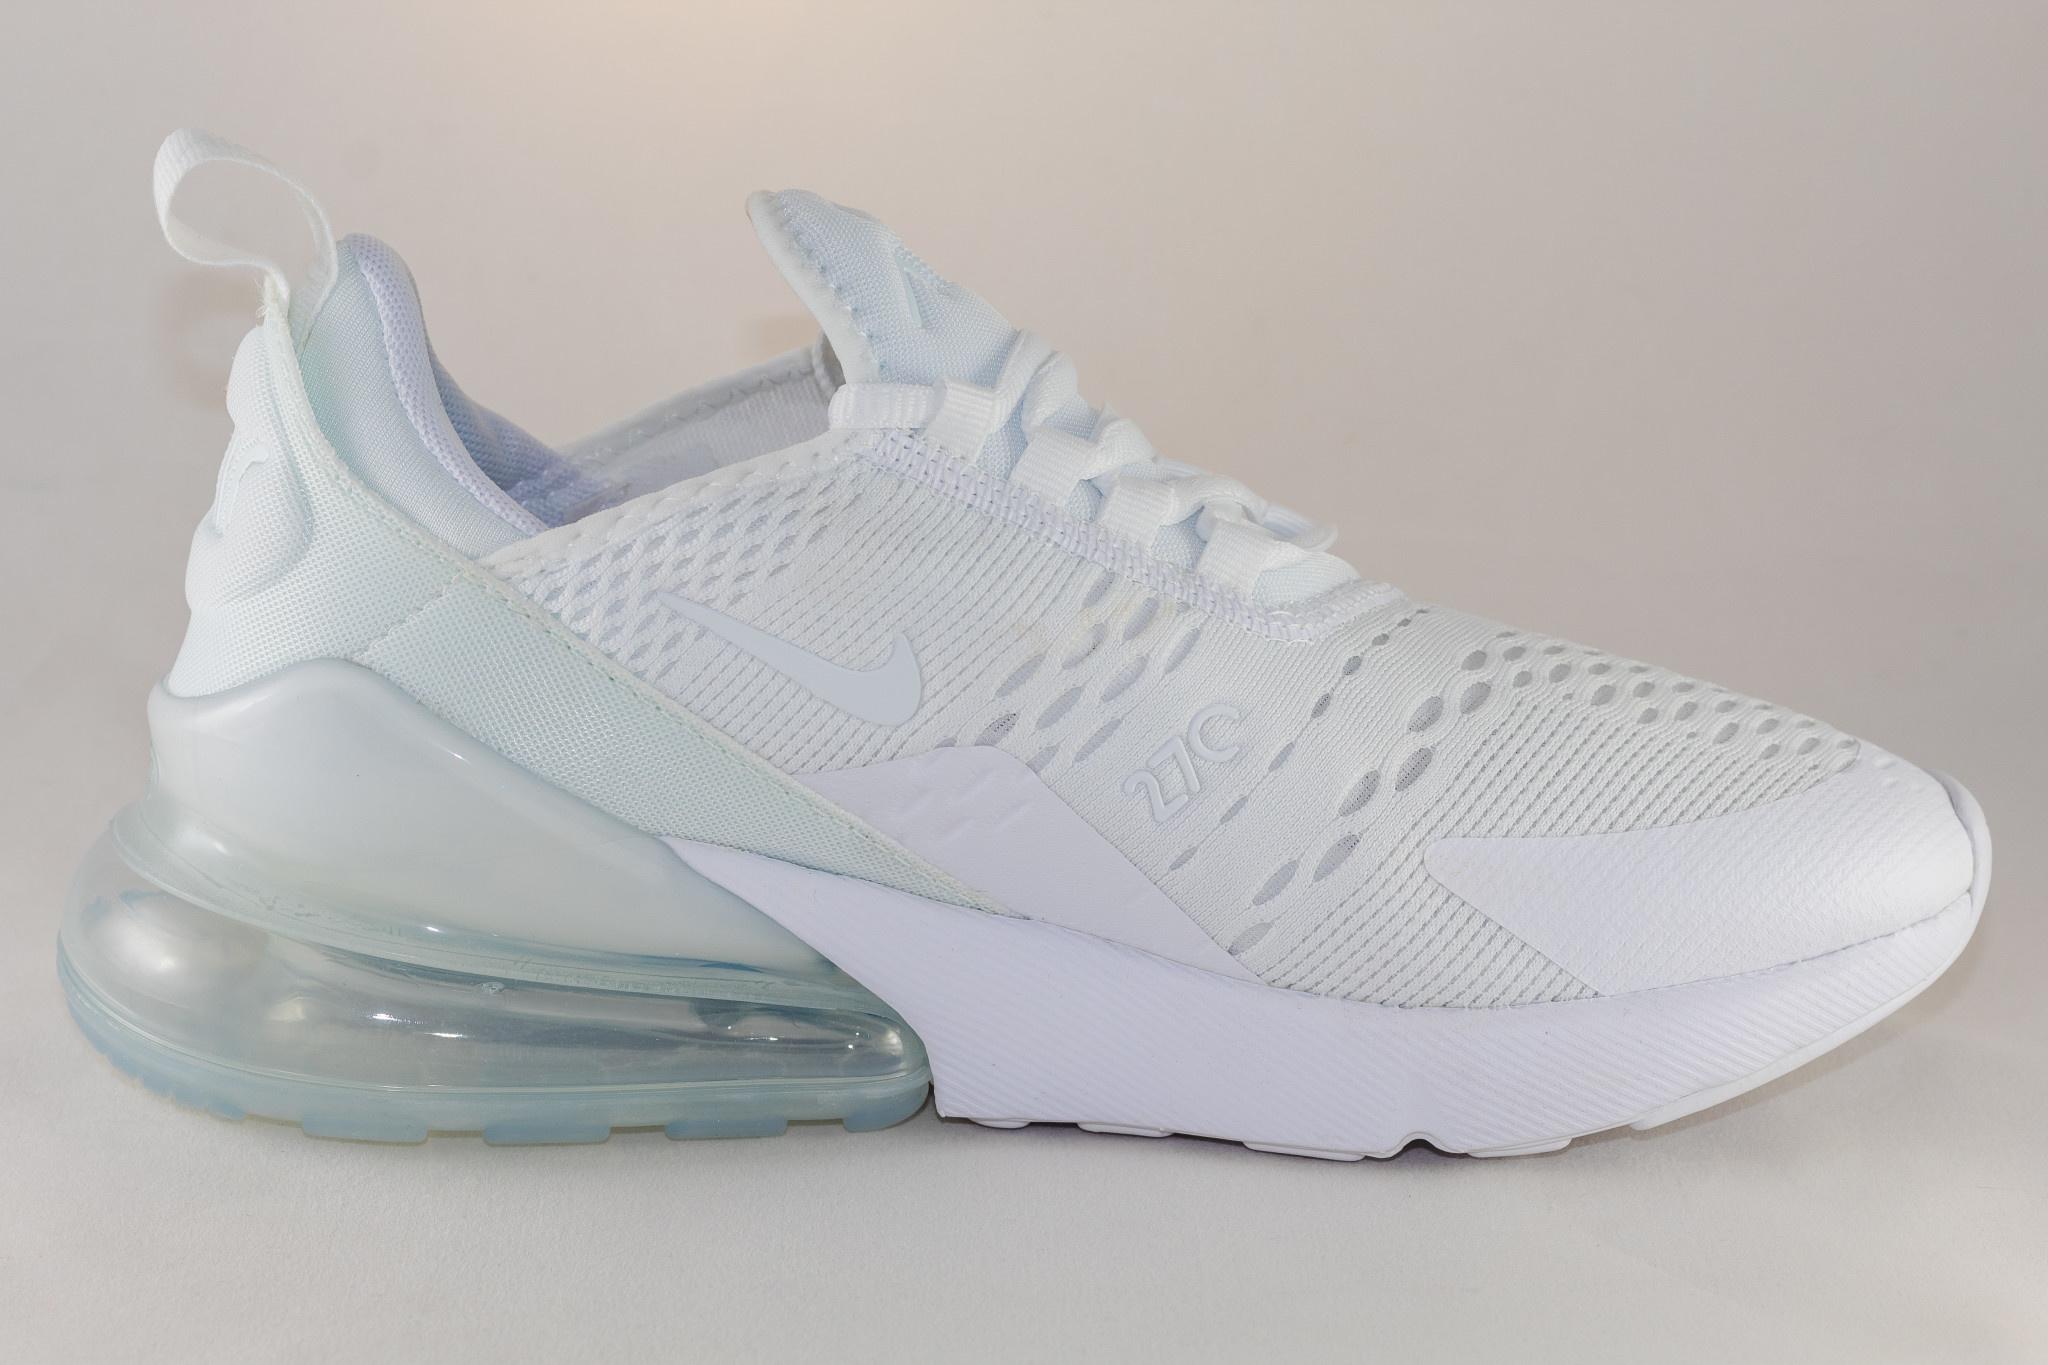 Nike J NIKE AIR MAX 270 (gs) White/ White- Metallic Silver